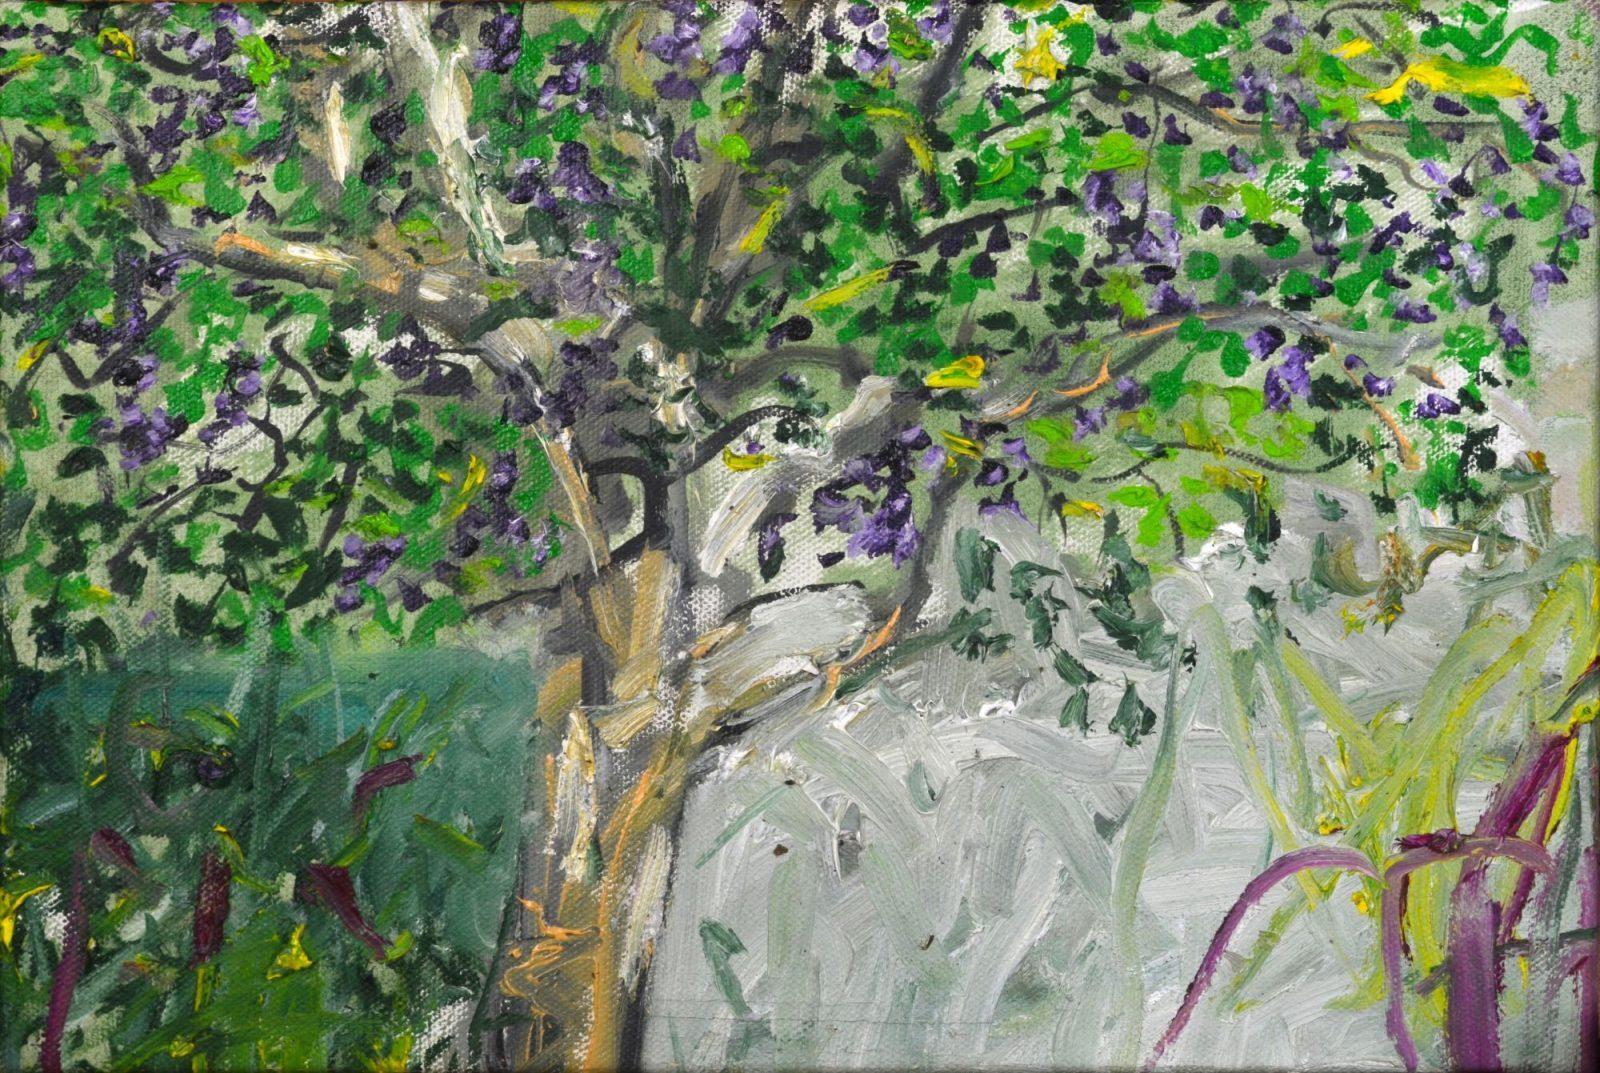 franyo aatoth: Garden Series 10.